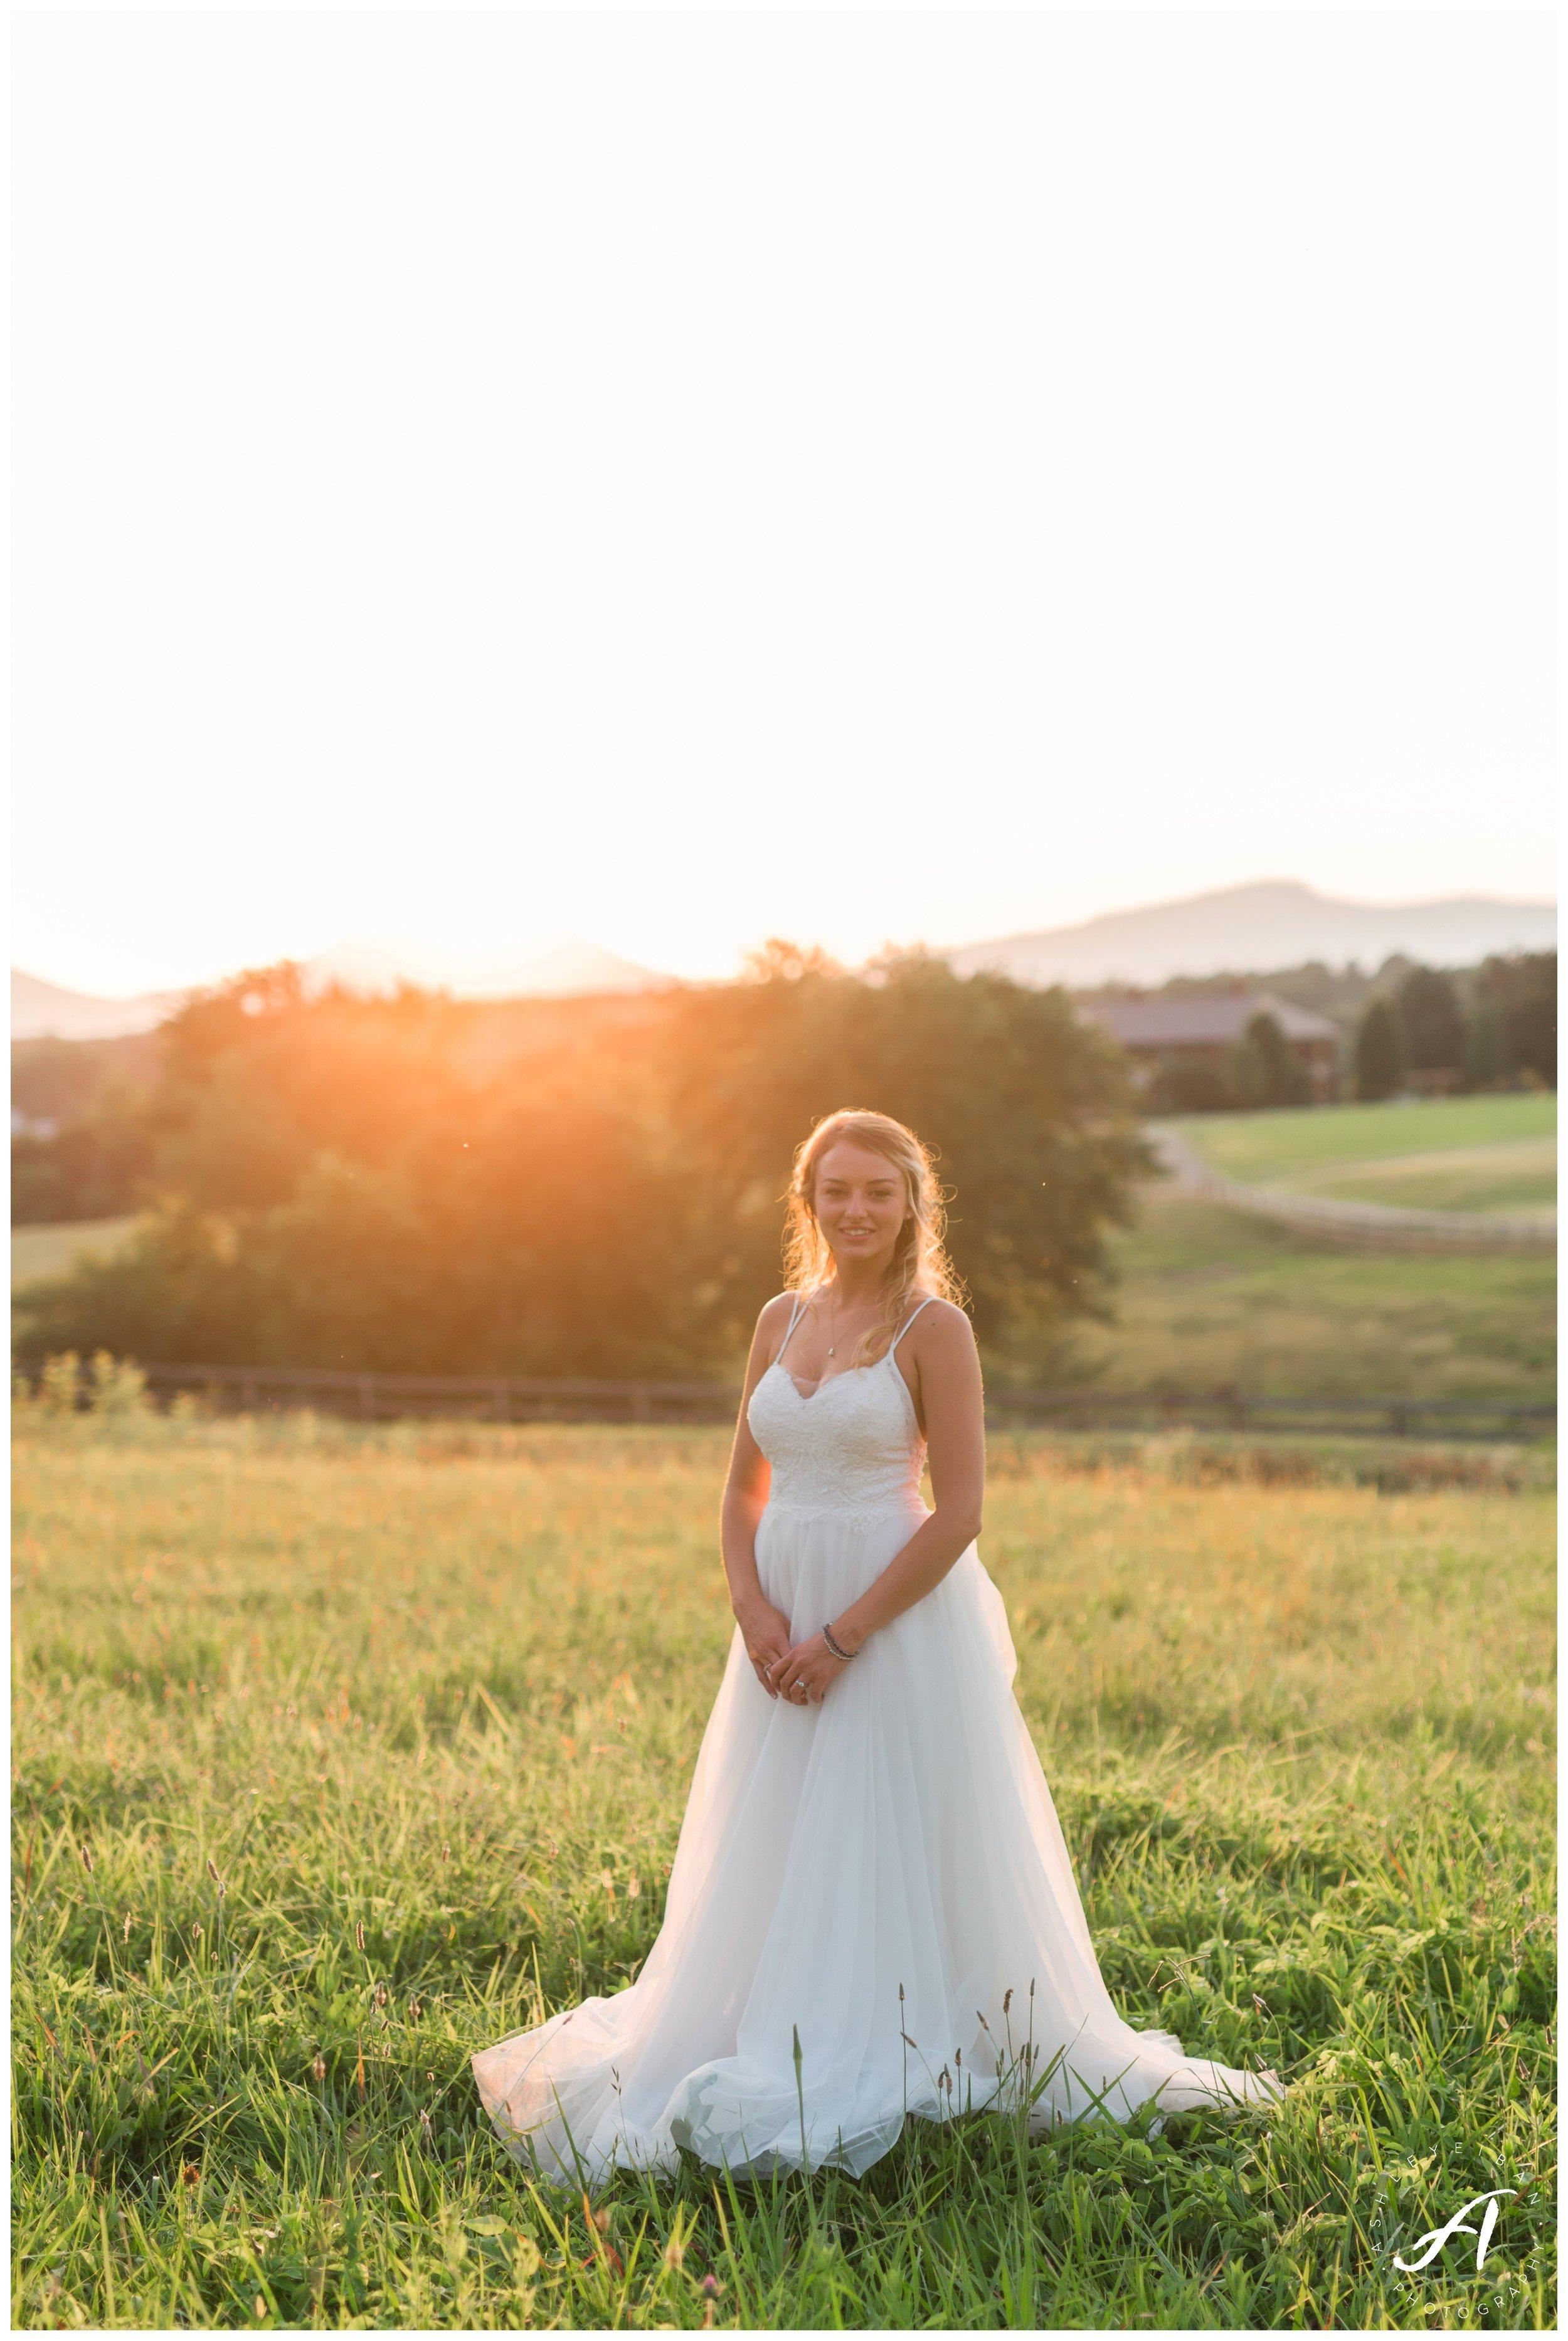 Central Virginia, Lynchburg Wedding Photographer || Trivium Estate Wedding in Forest, Virginia || www.ashleyeiban.com